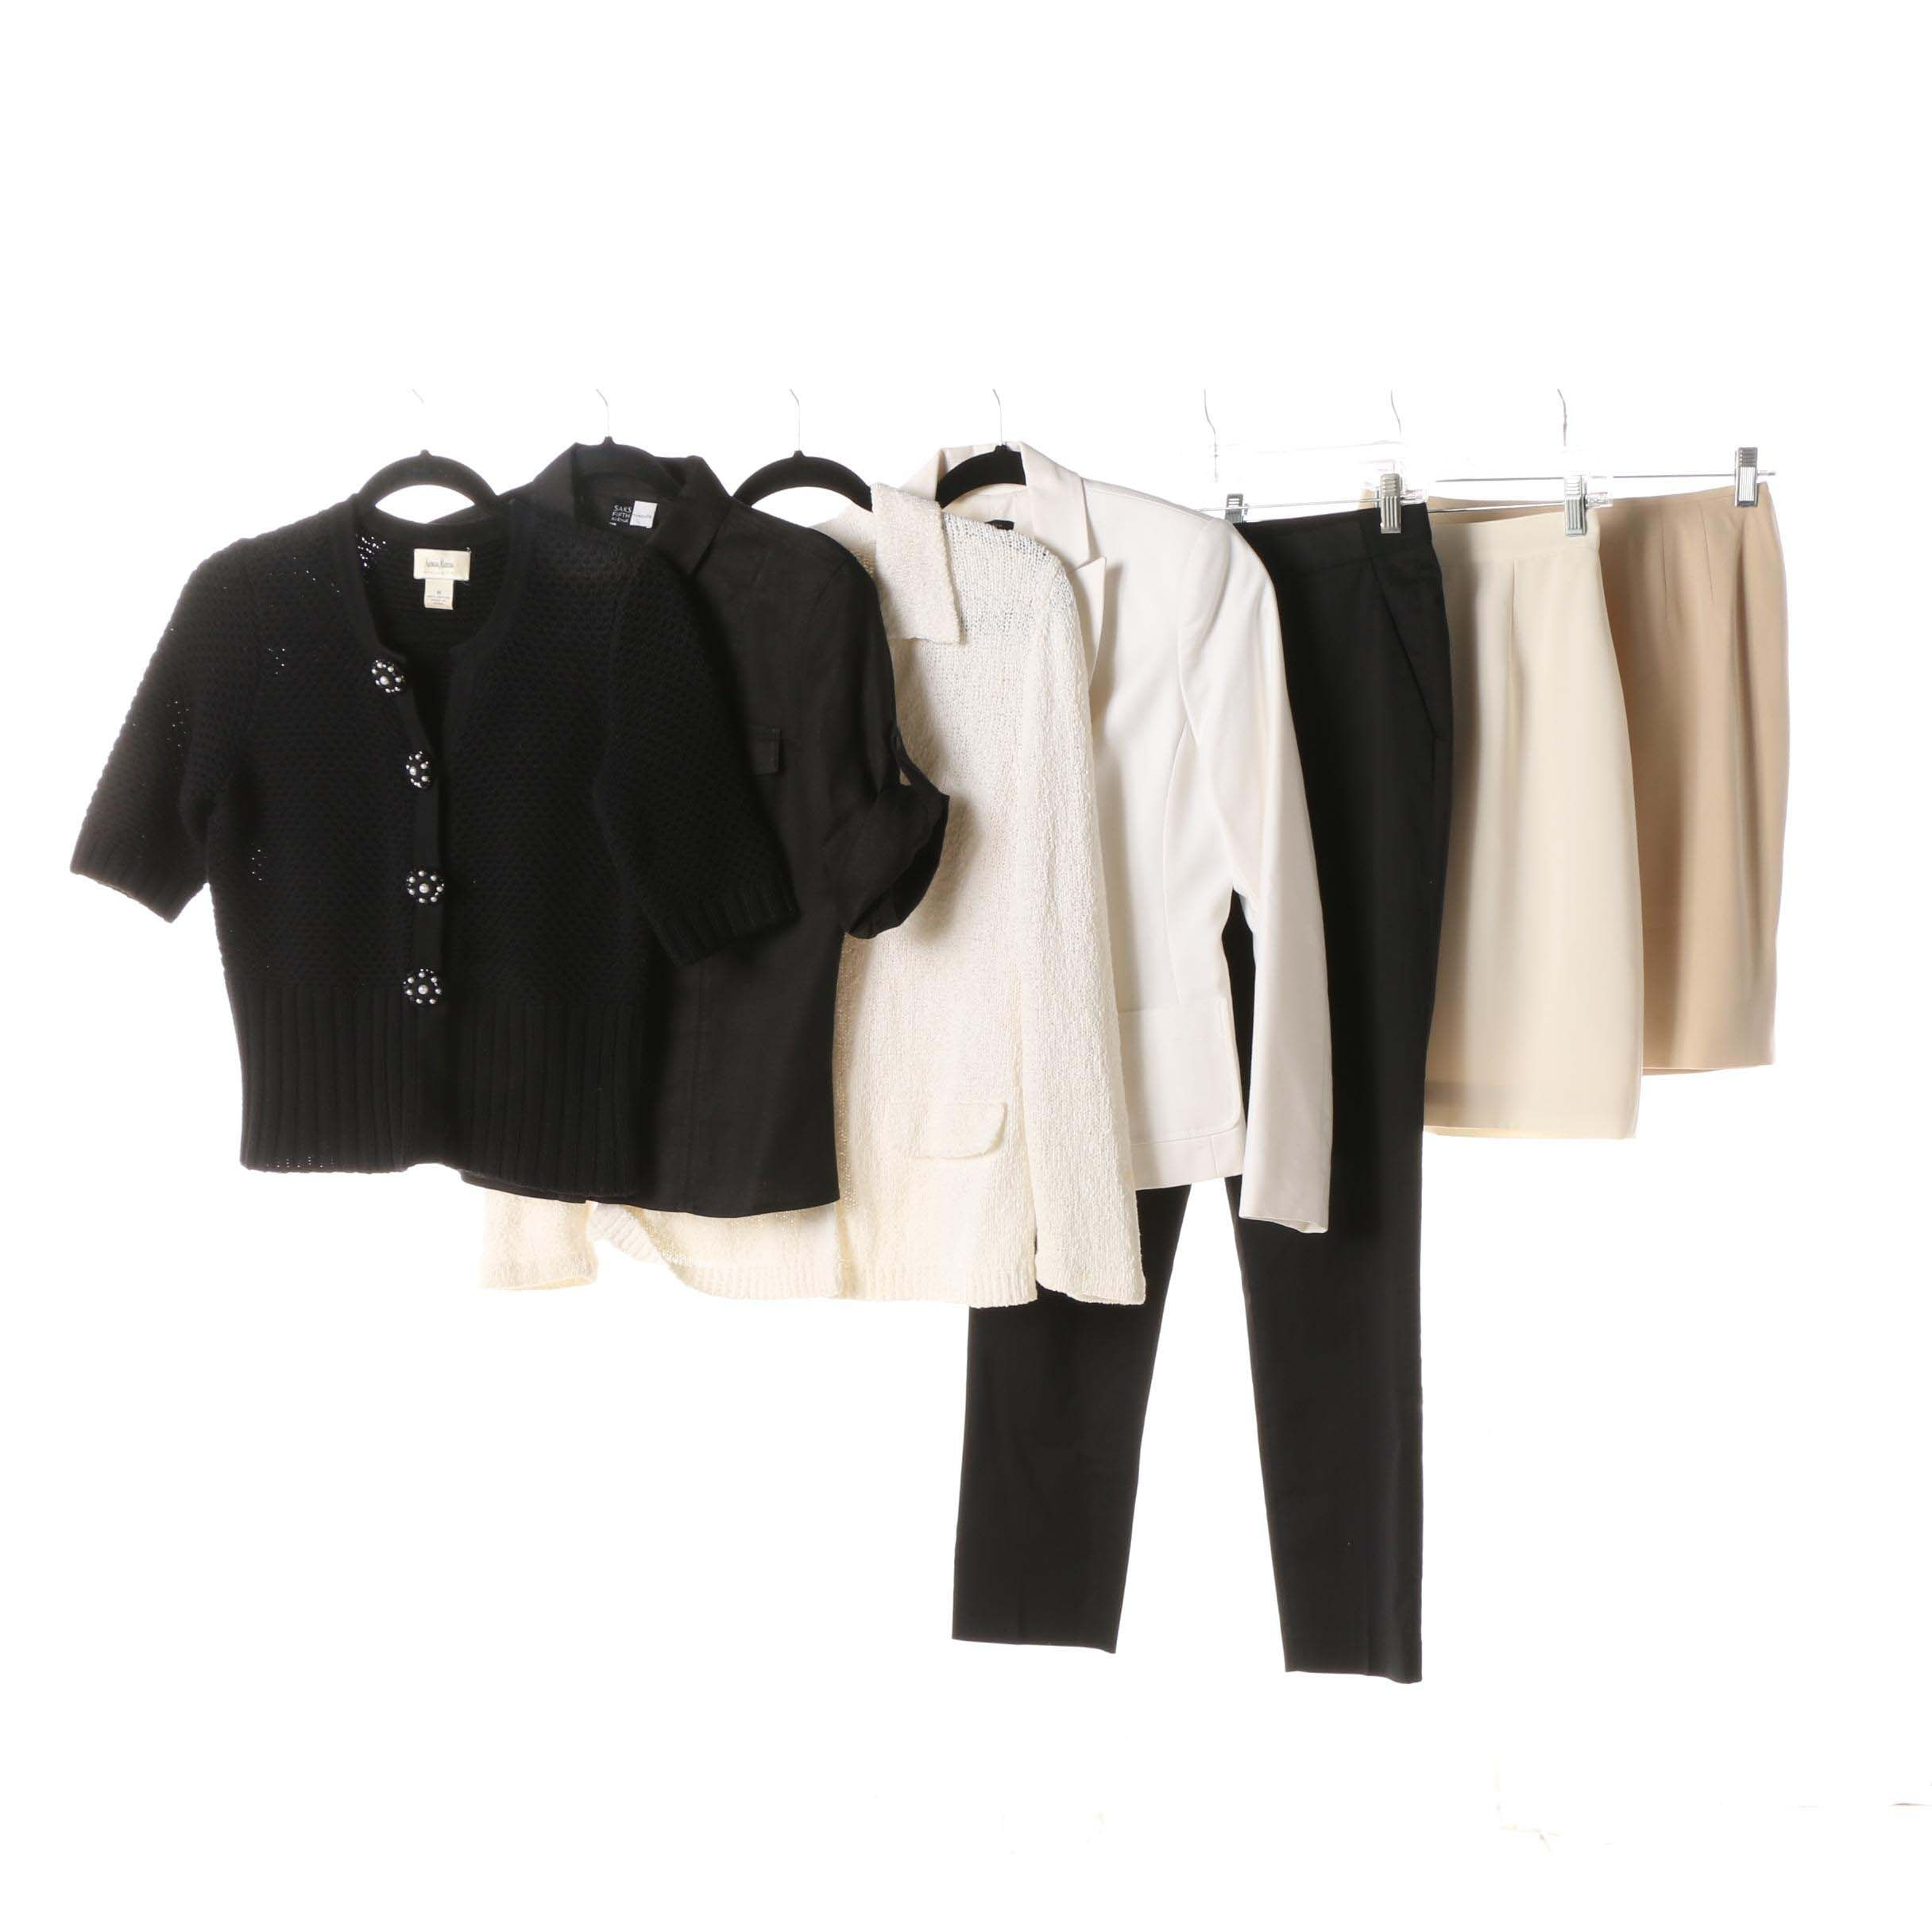 Women's Separates Including Neiman Marcus, Lafayette 148 New York and Uniqlo